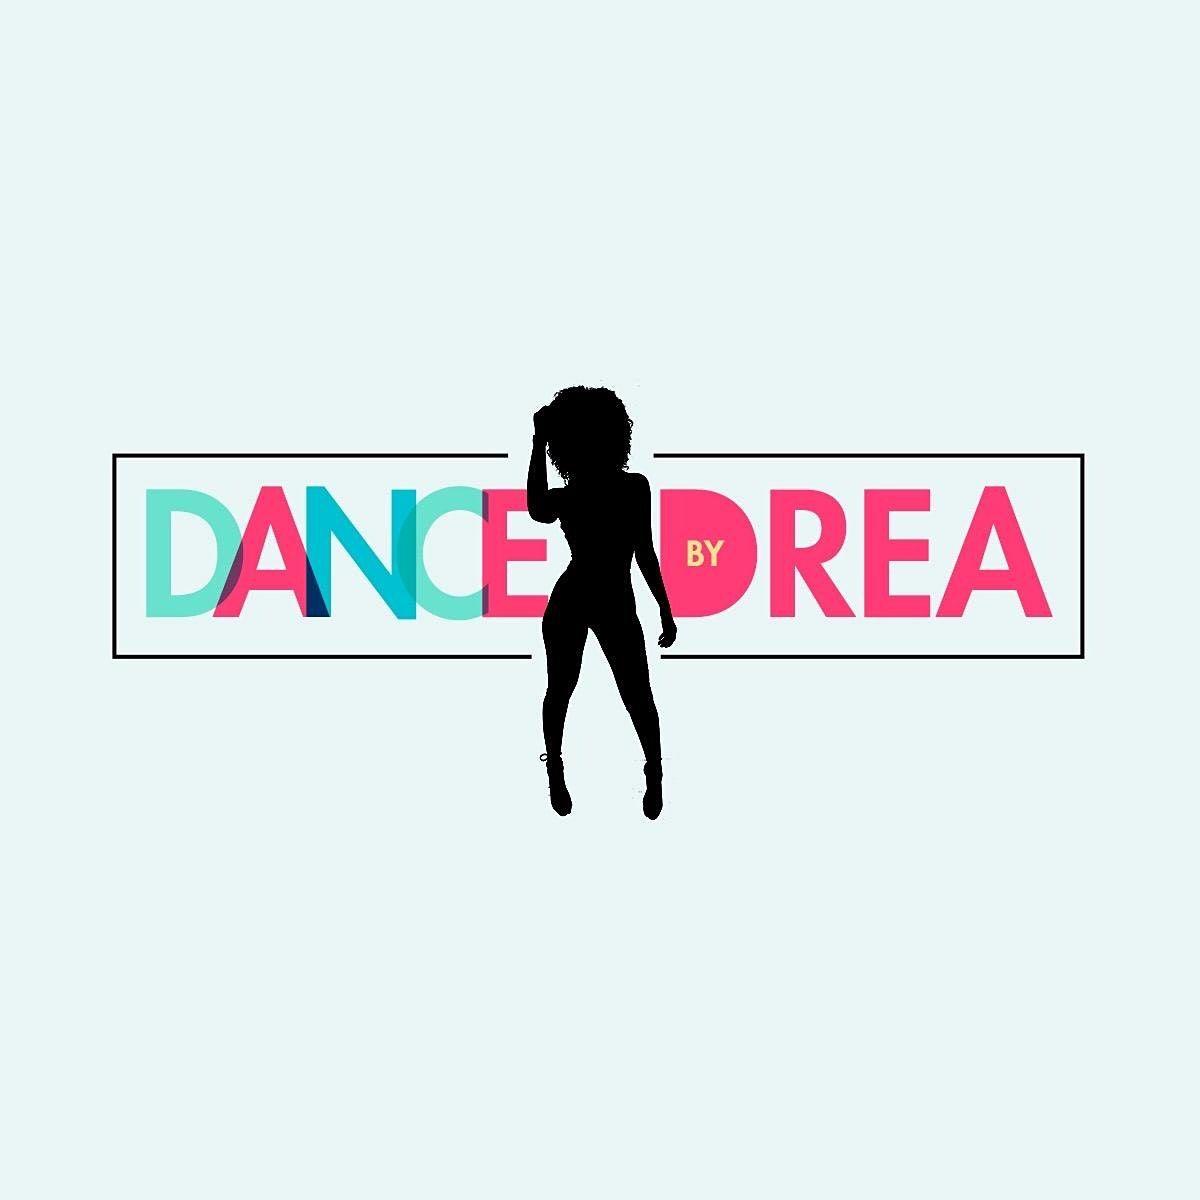 DancebyDrea Charity Event